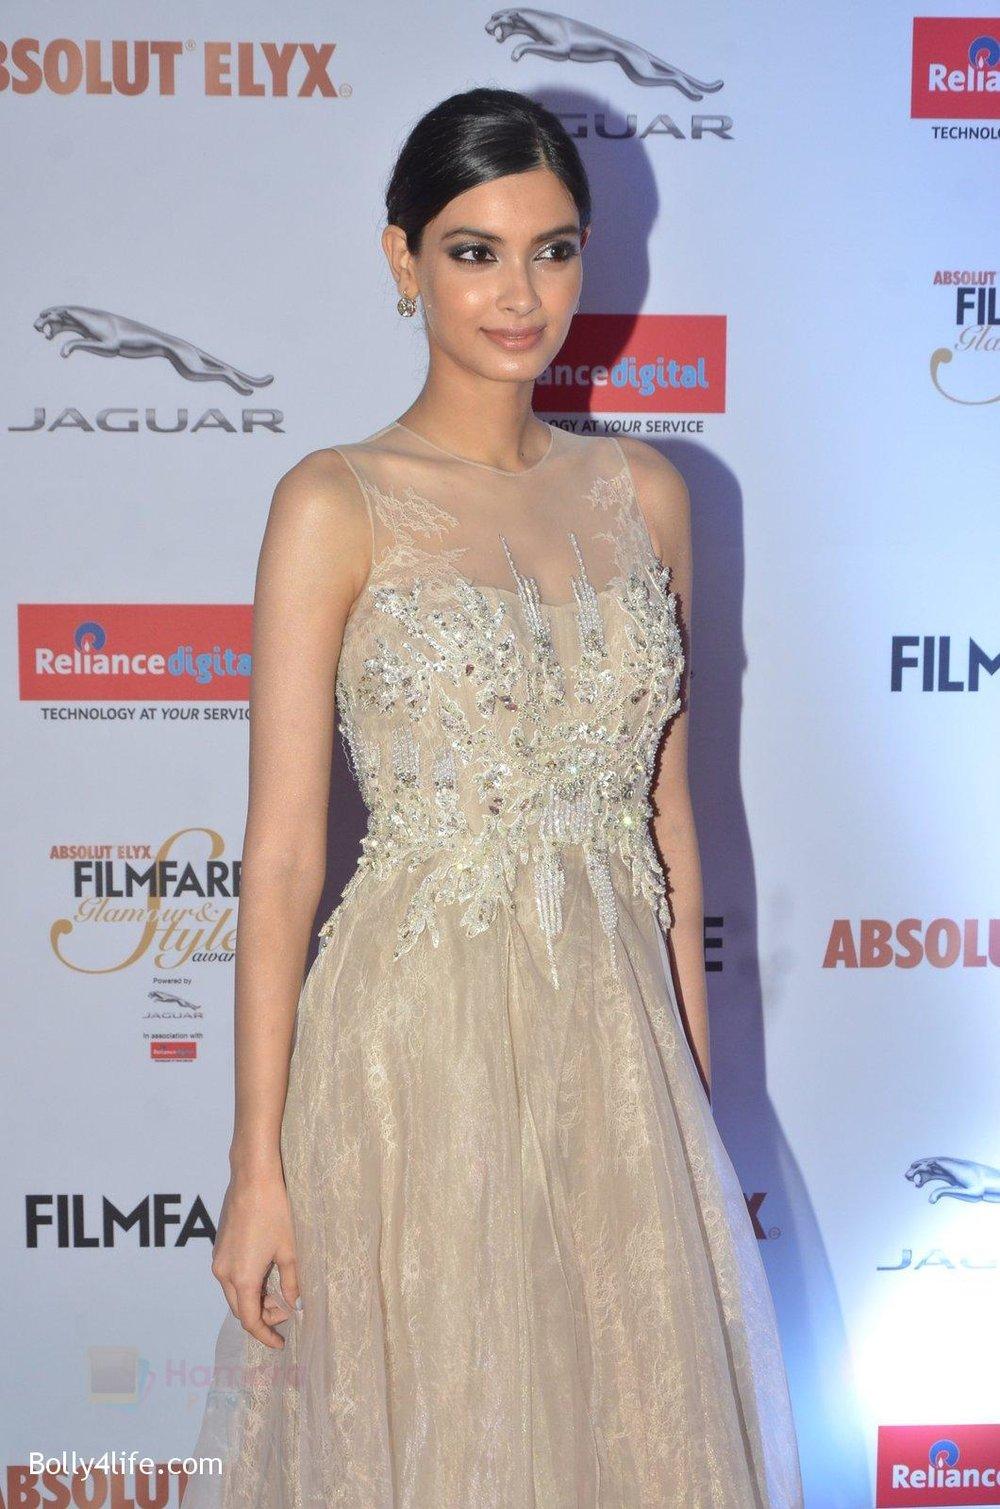 Diana-Penty-at-Filmfare-Glamour-Style-Awards-2016-in-Mumbai-on-15th-Oct-2016-1809.jpg